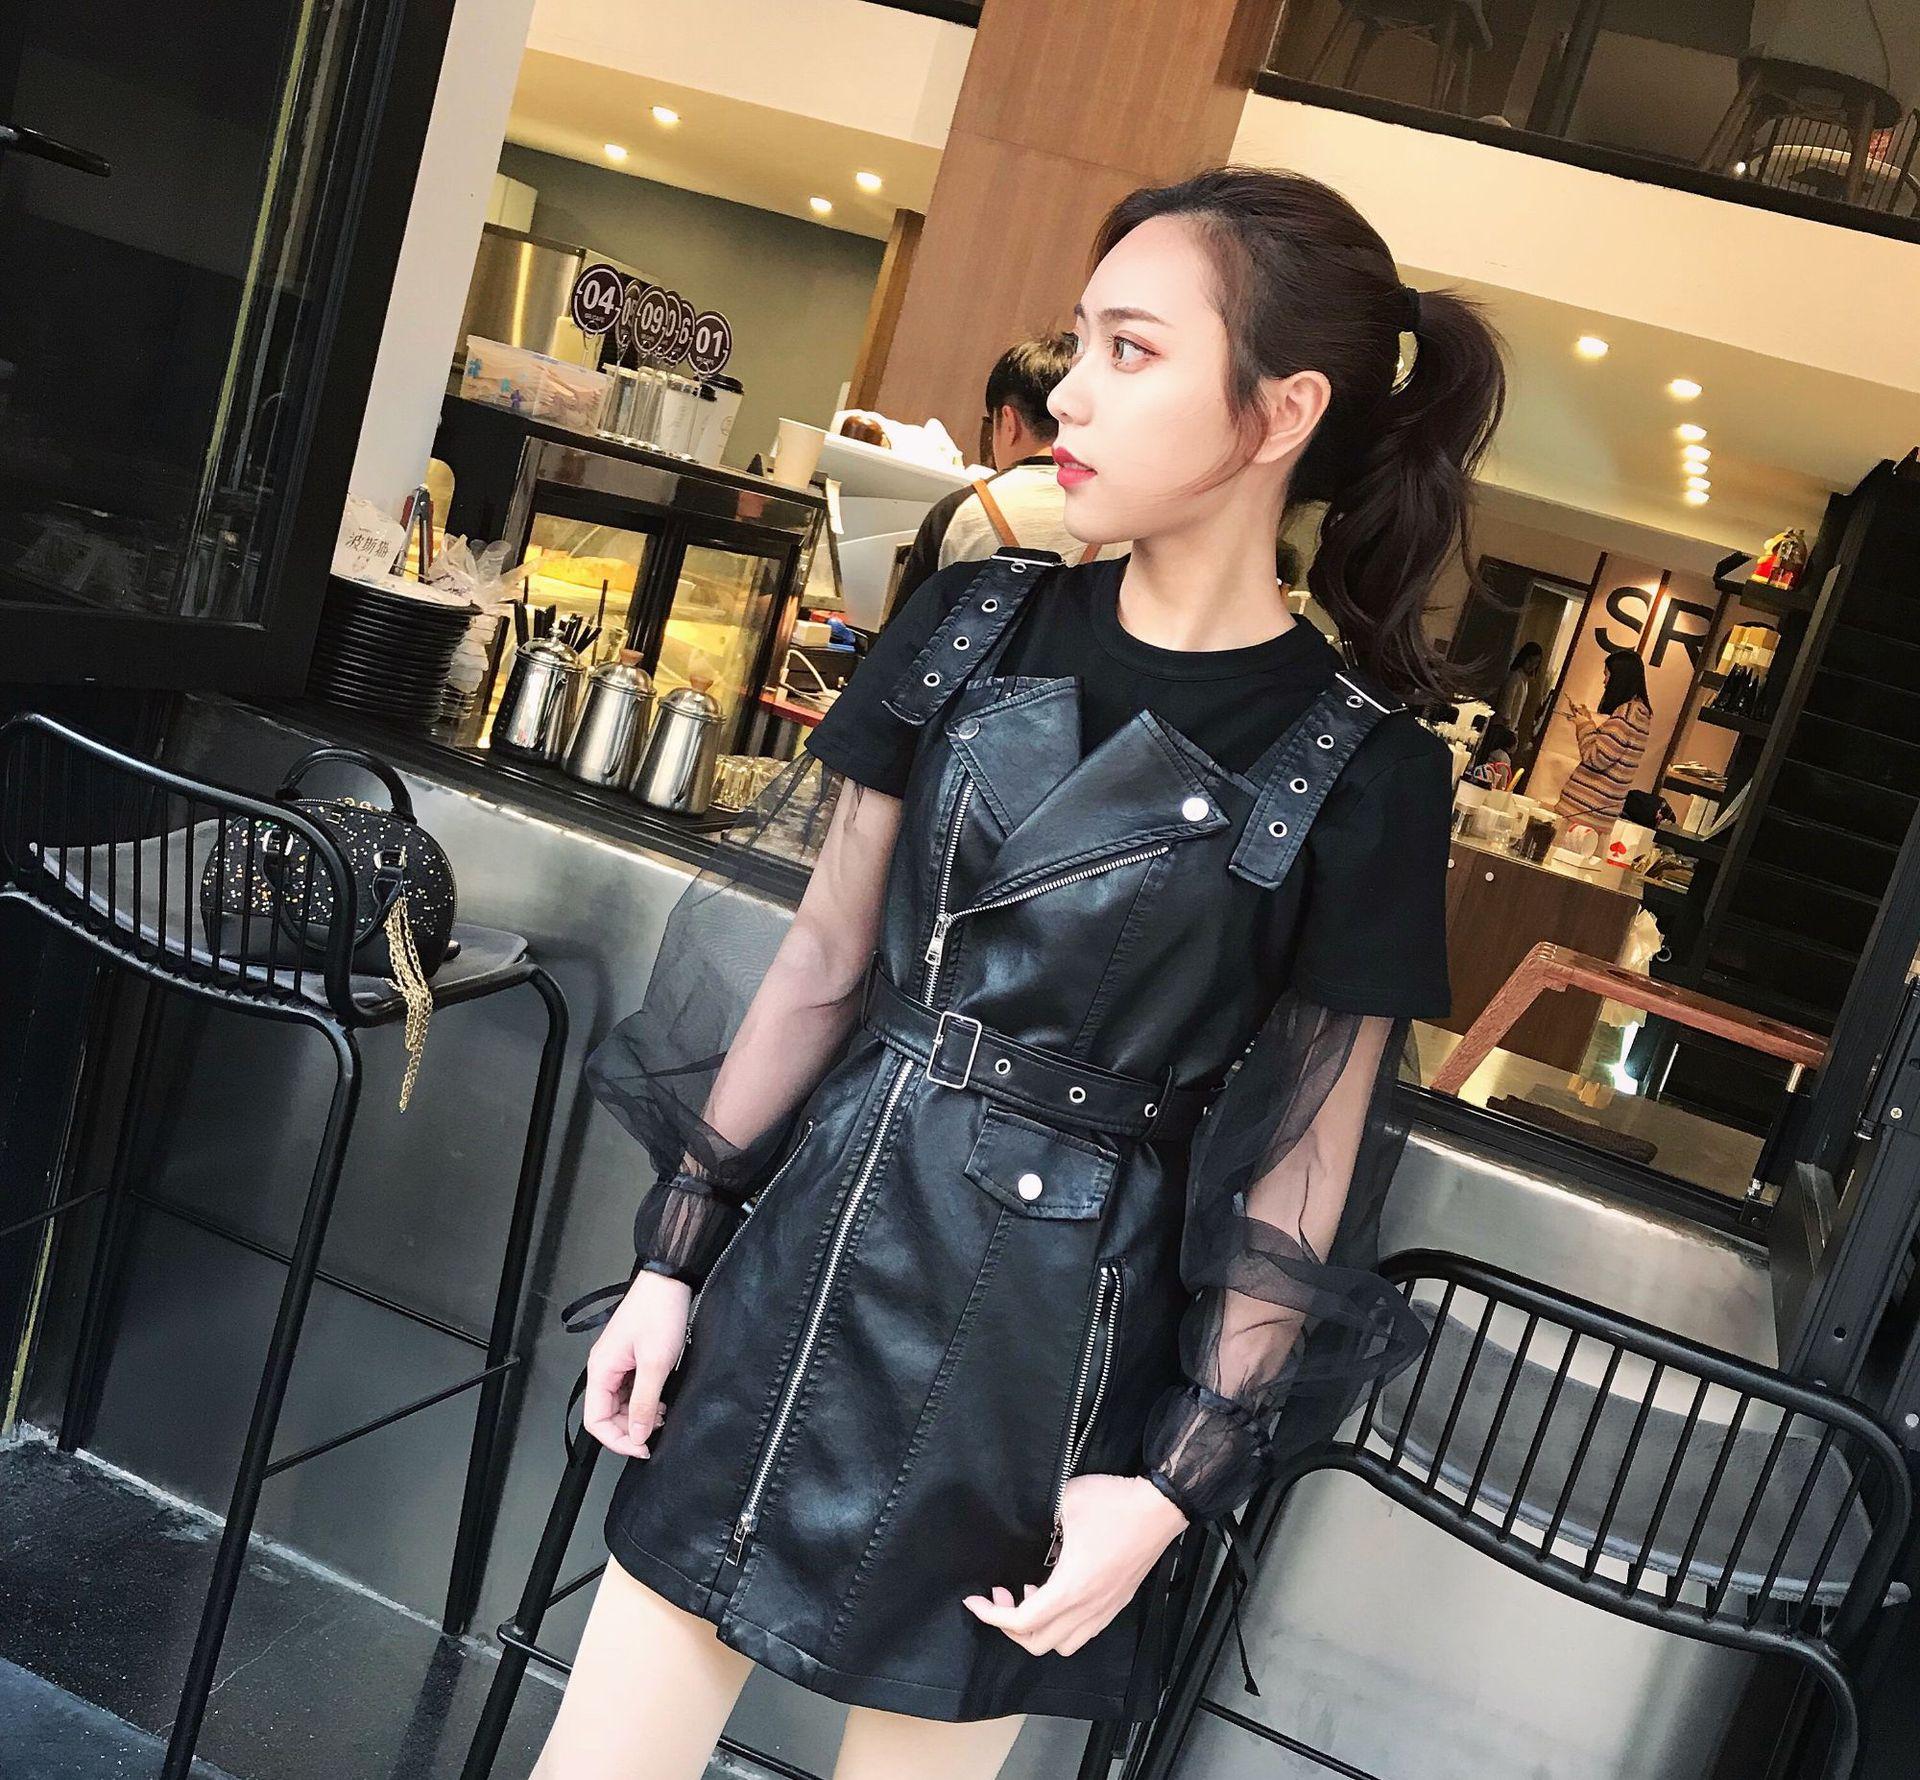 Sangle Lx1806 Plus Zipper Femmes Courtes Xing gray 5xl En Mini Robes Noir Taille V Red Mode Cuir Cou Automne 2018 Pu La Robe Sexy Se black wine T3lKuF1Jc